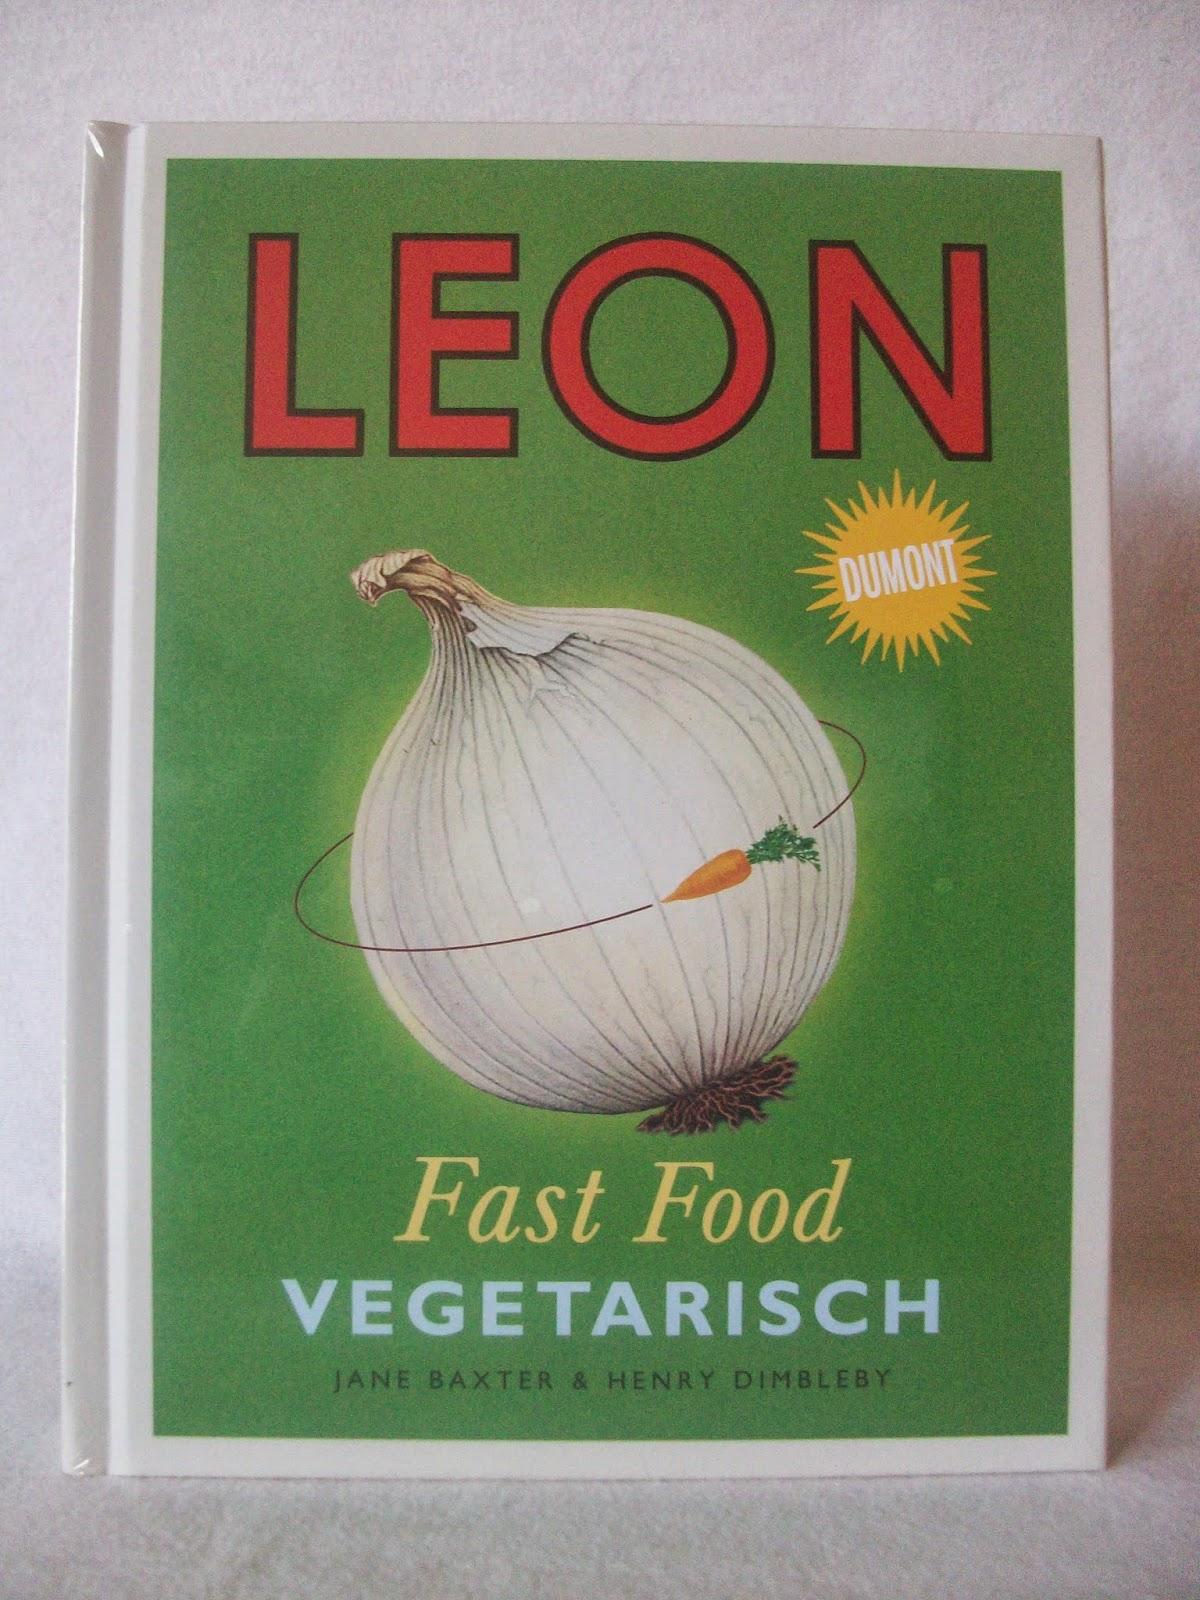 http://www.dumont-buchverlag.de/buch/Henry_Dimbleby_Leon_Fast_Food._Vegetarisch/13764